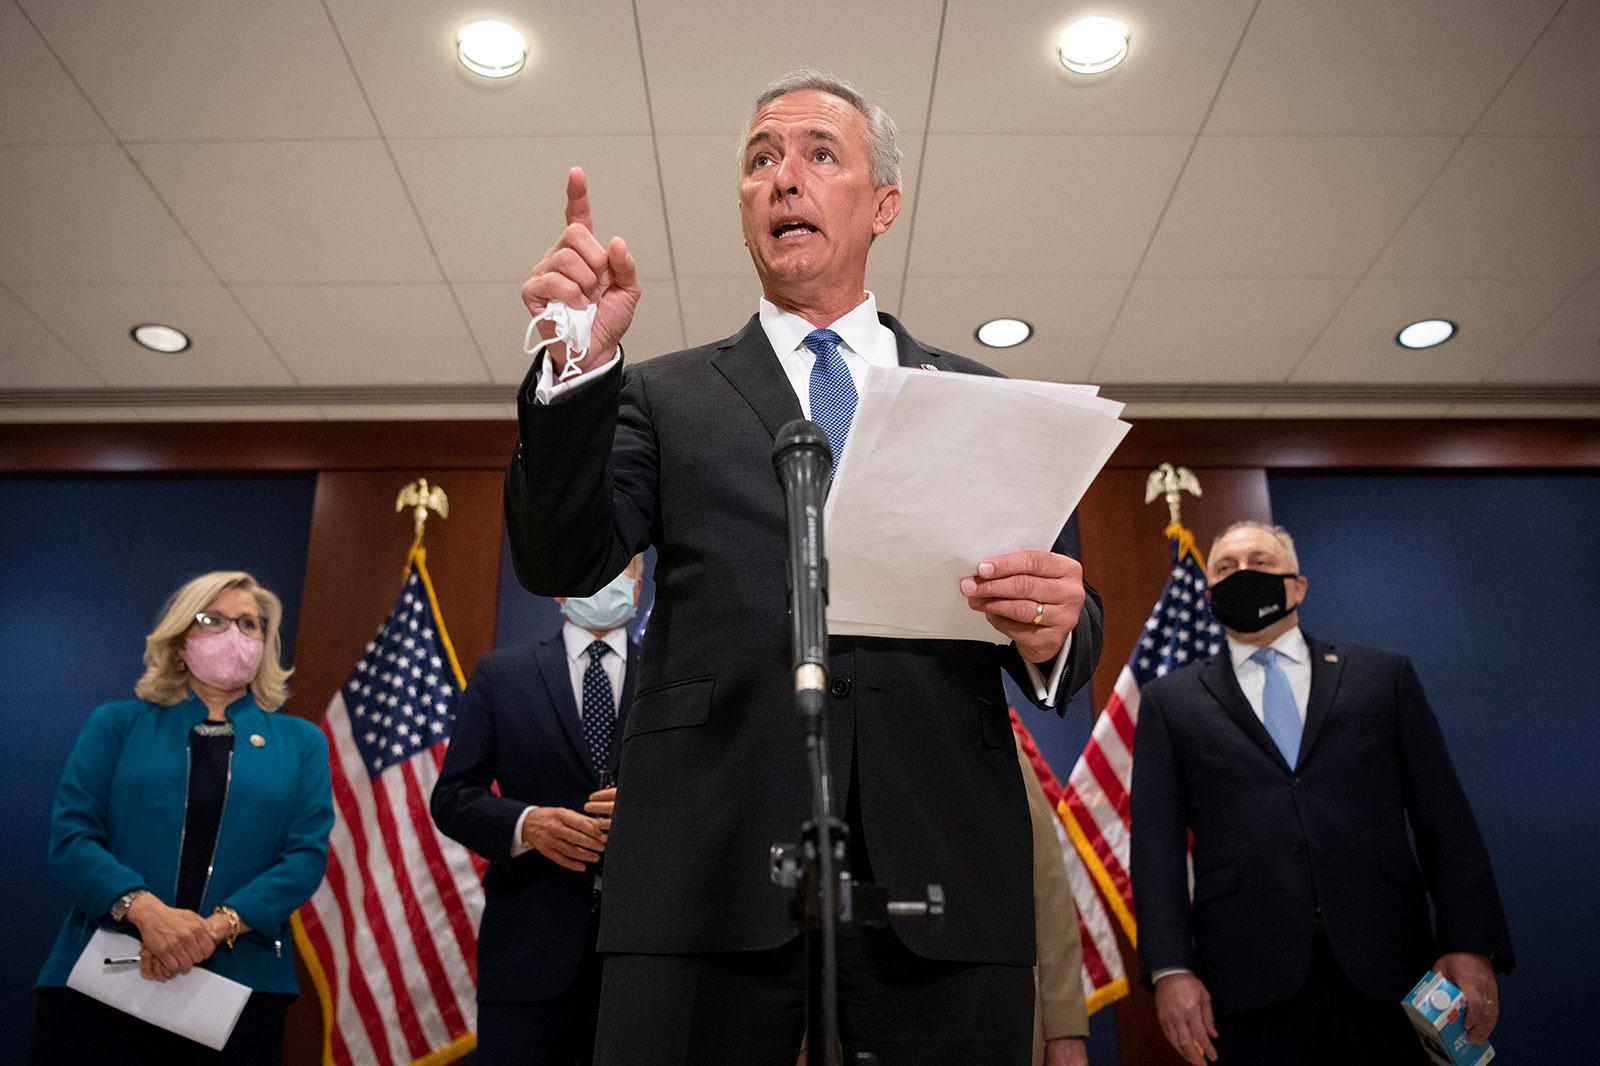 Rep. John Katko speaks at a press conference on April 14.